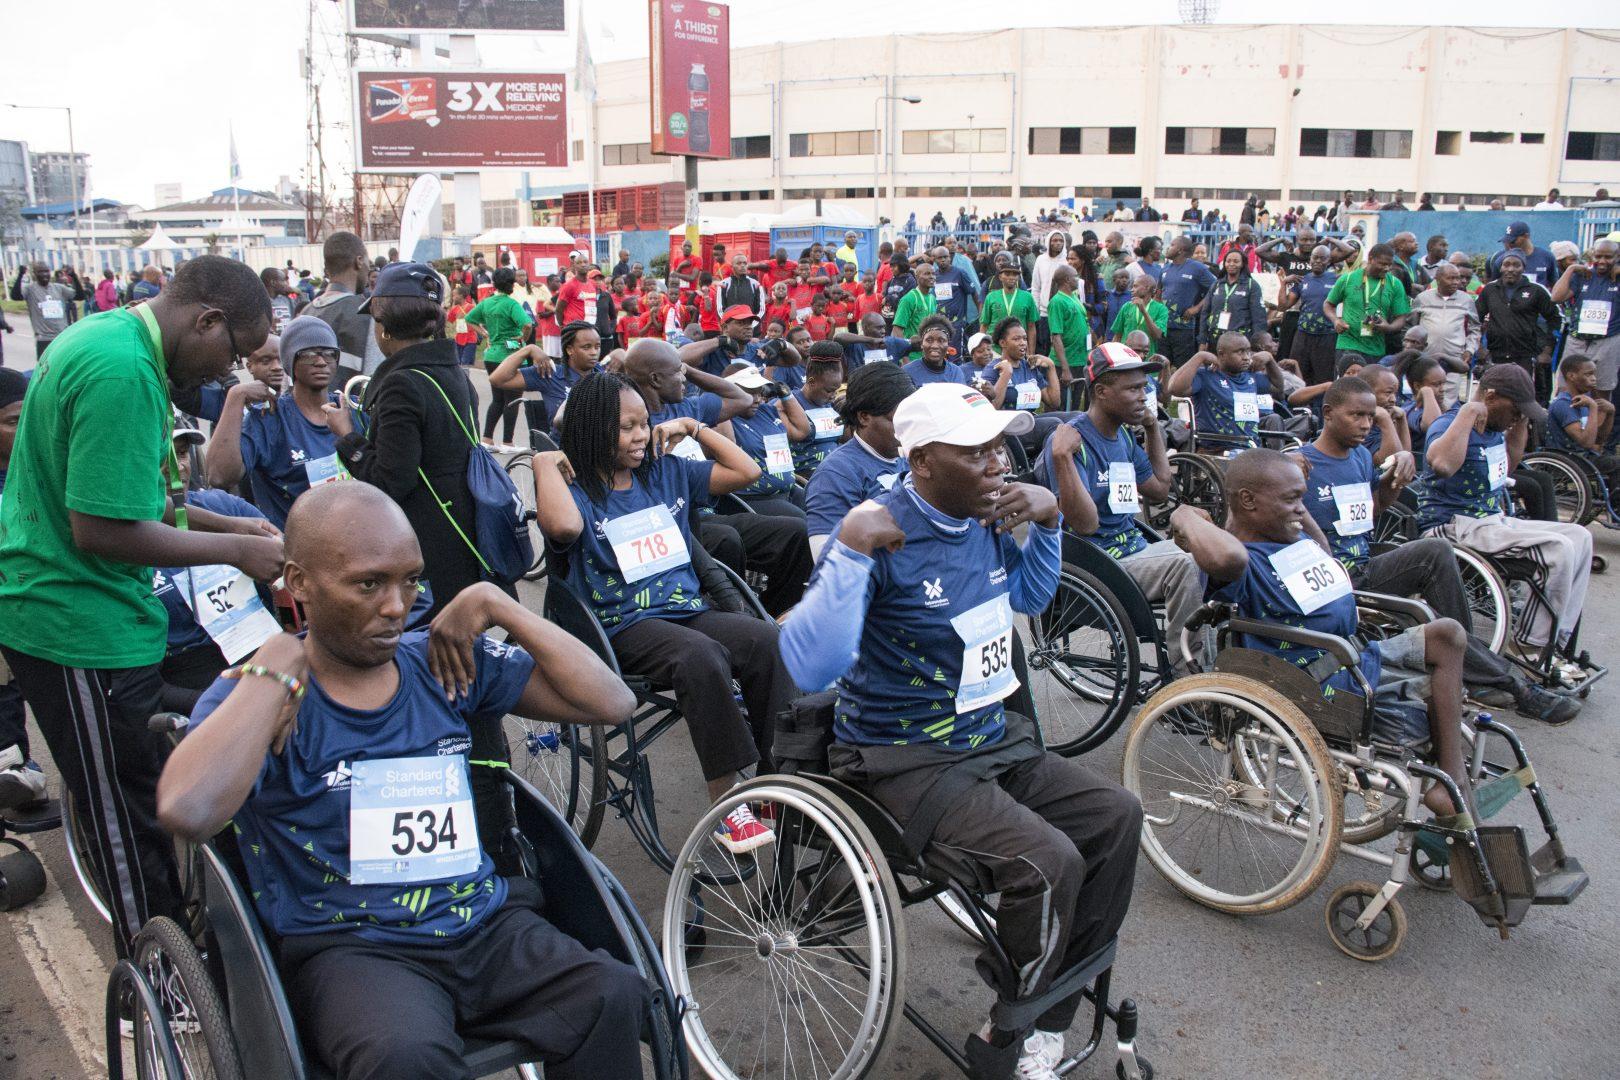 https://www.nairobimarathon.com/wp-content/uploads/2021/07/DSC_2844.jpg